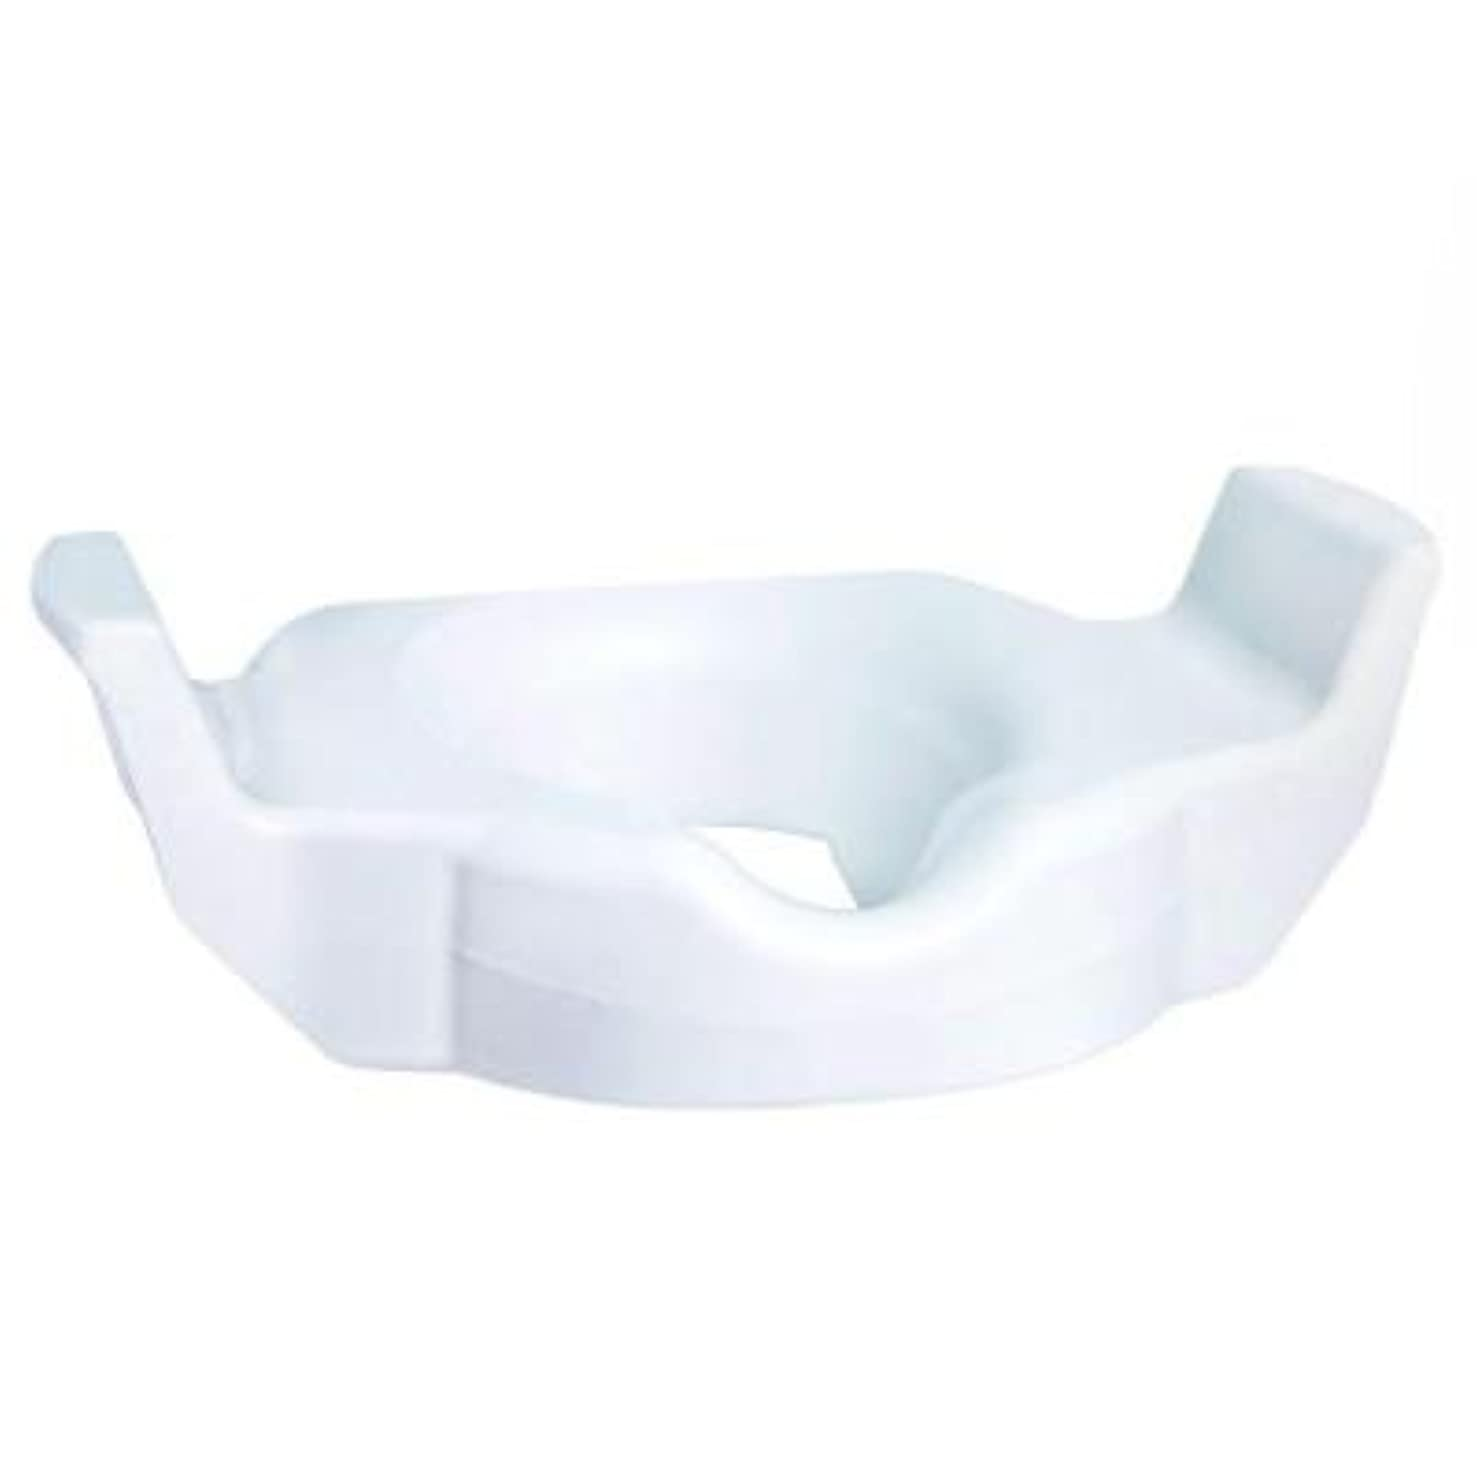 Glacier Bay TB-TSTDC-01 Universal Elevated Toilet Seat - White